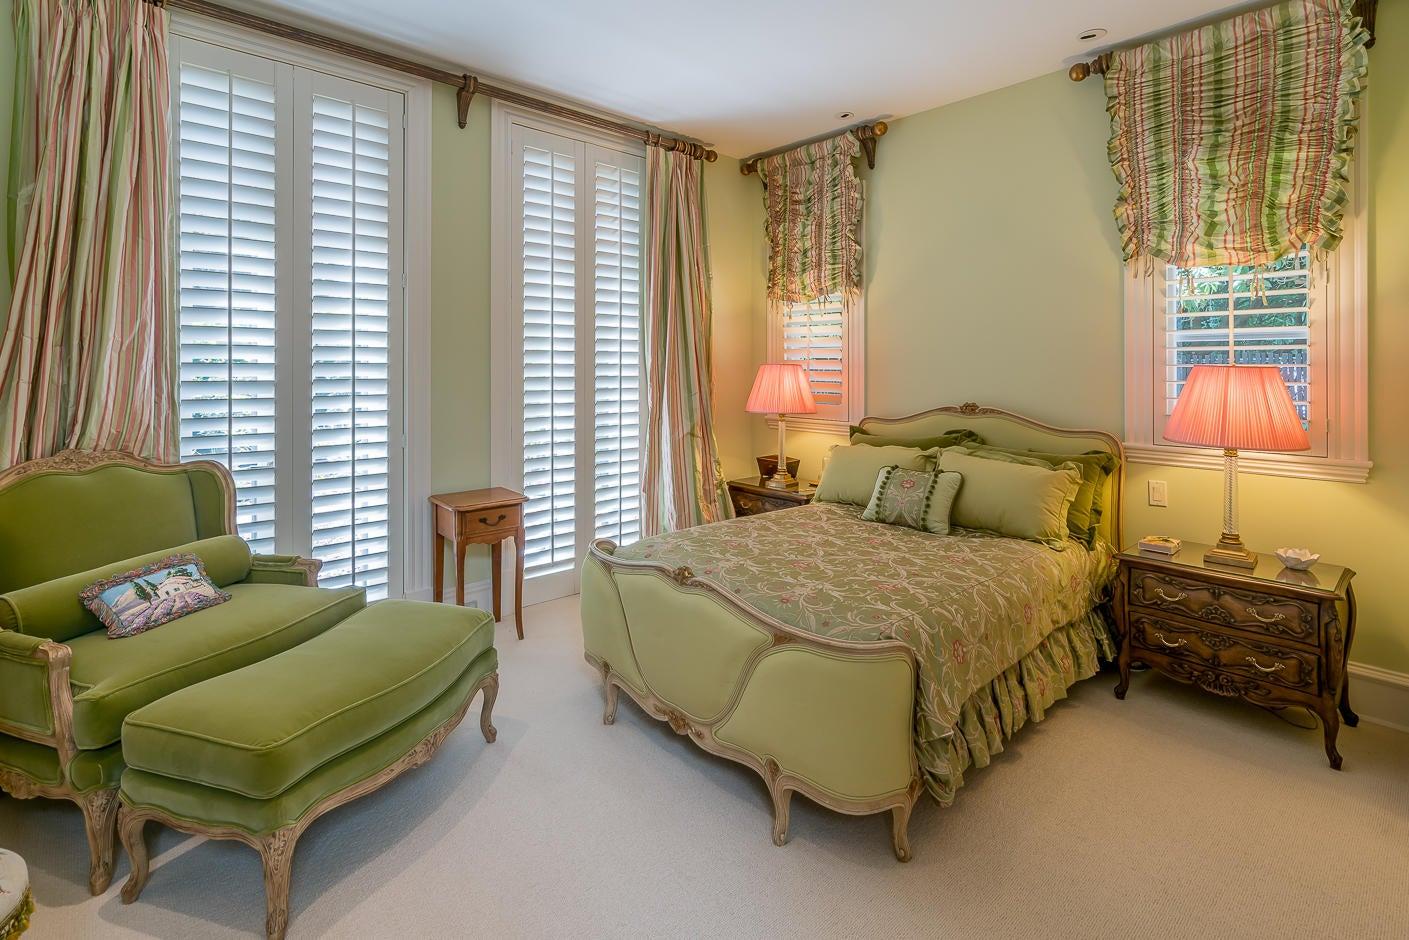 18 San Leandro bedroom 1